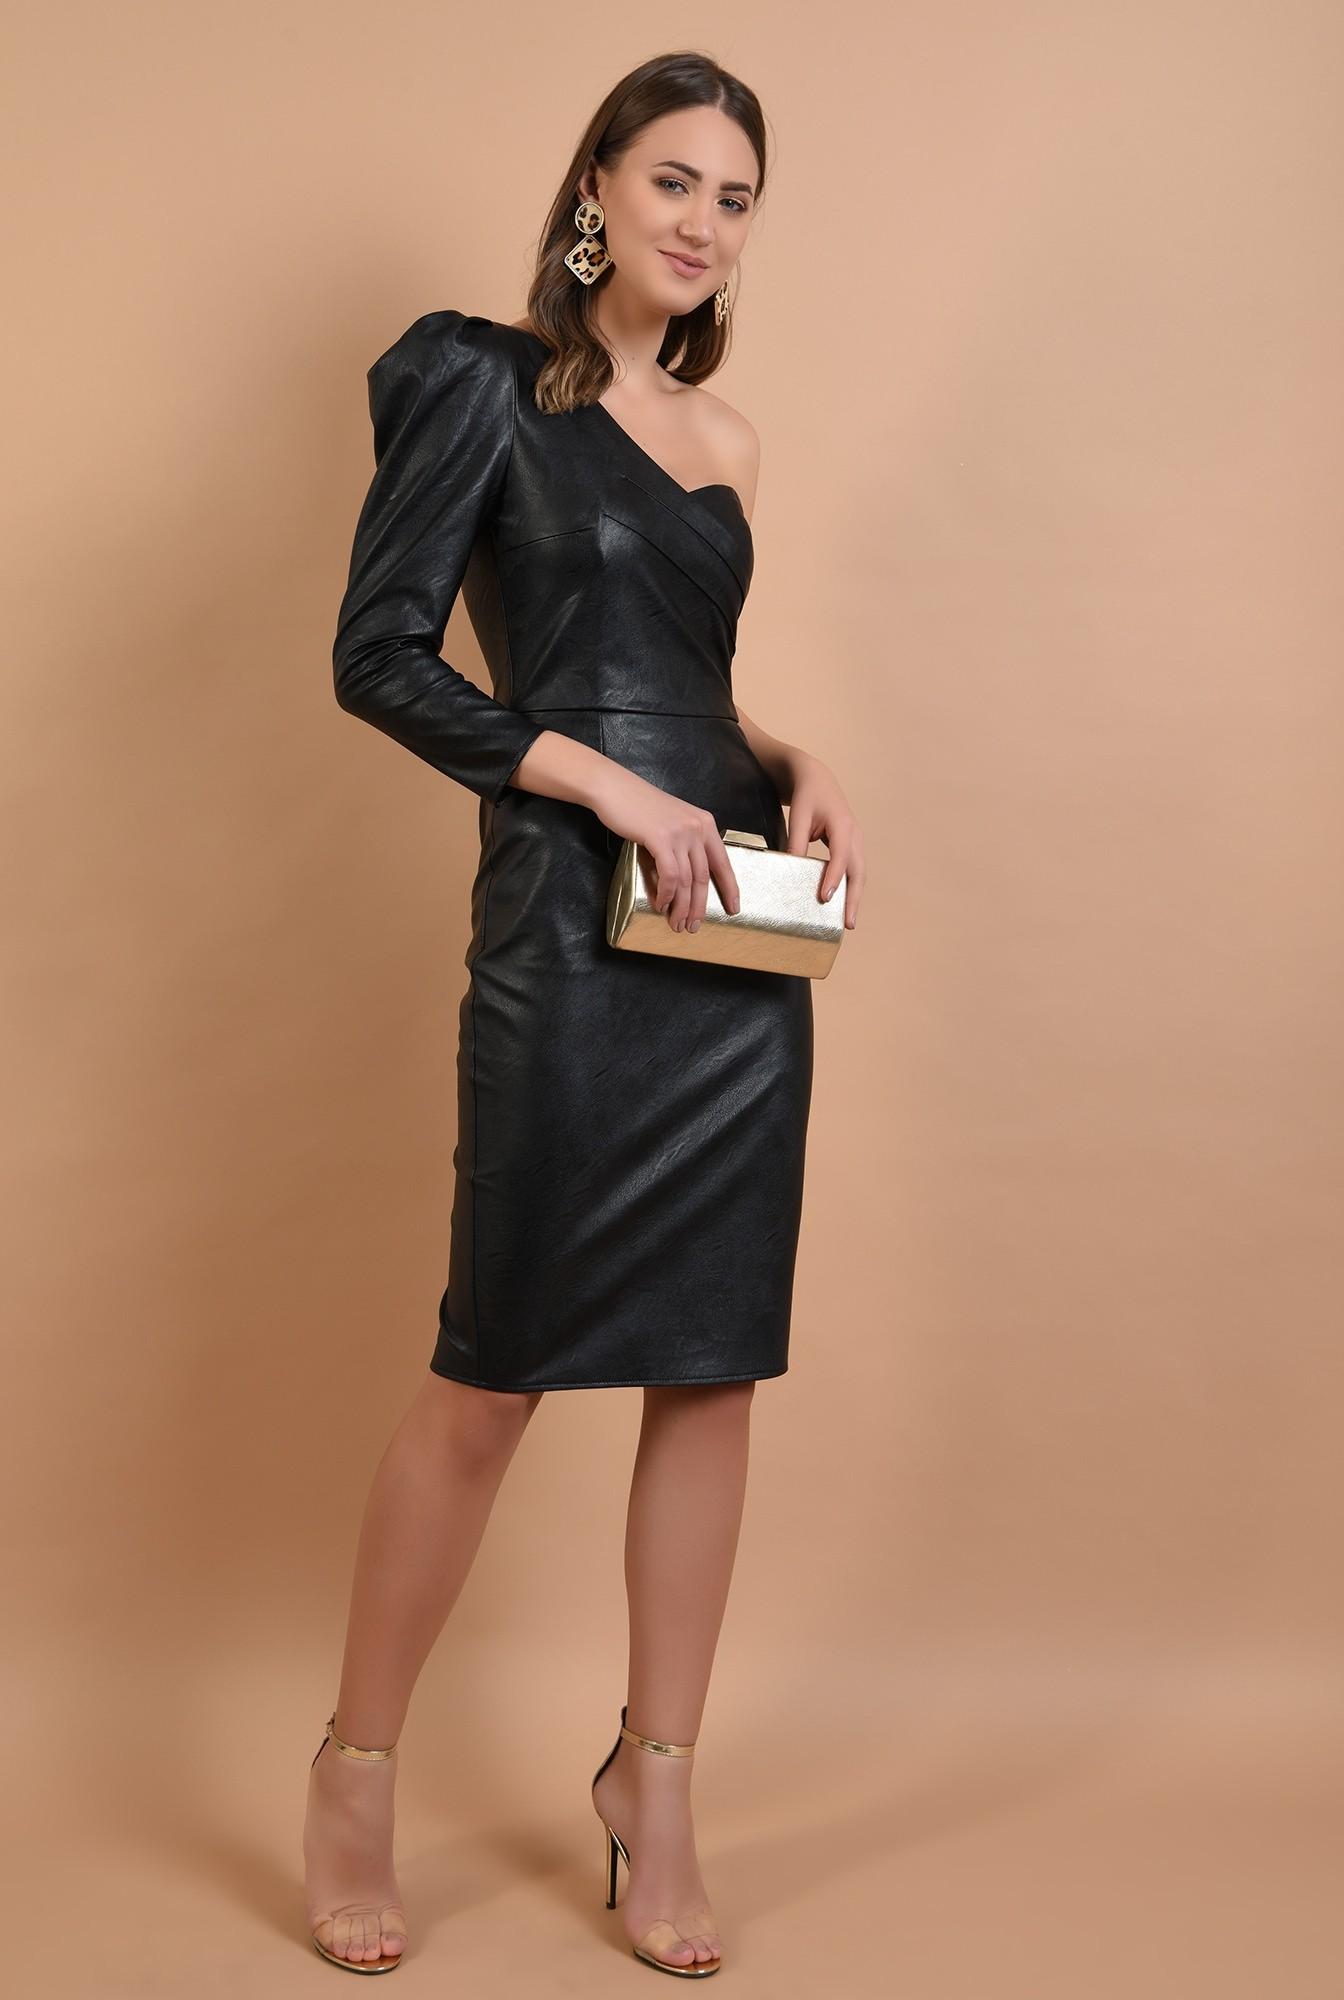 3 - rochie eleganta, piele neagra, maneca drapata, umar gol